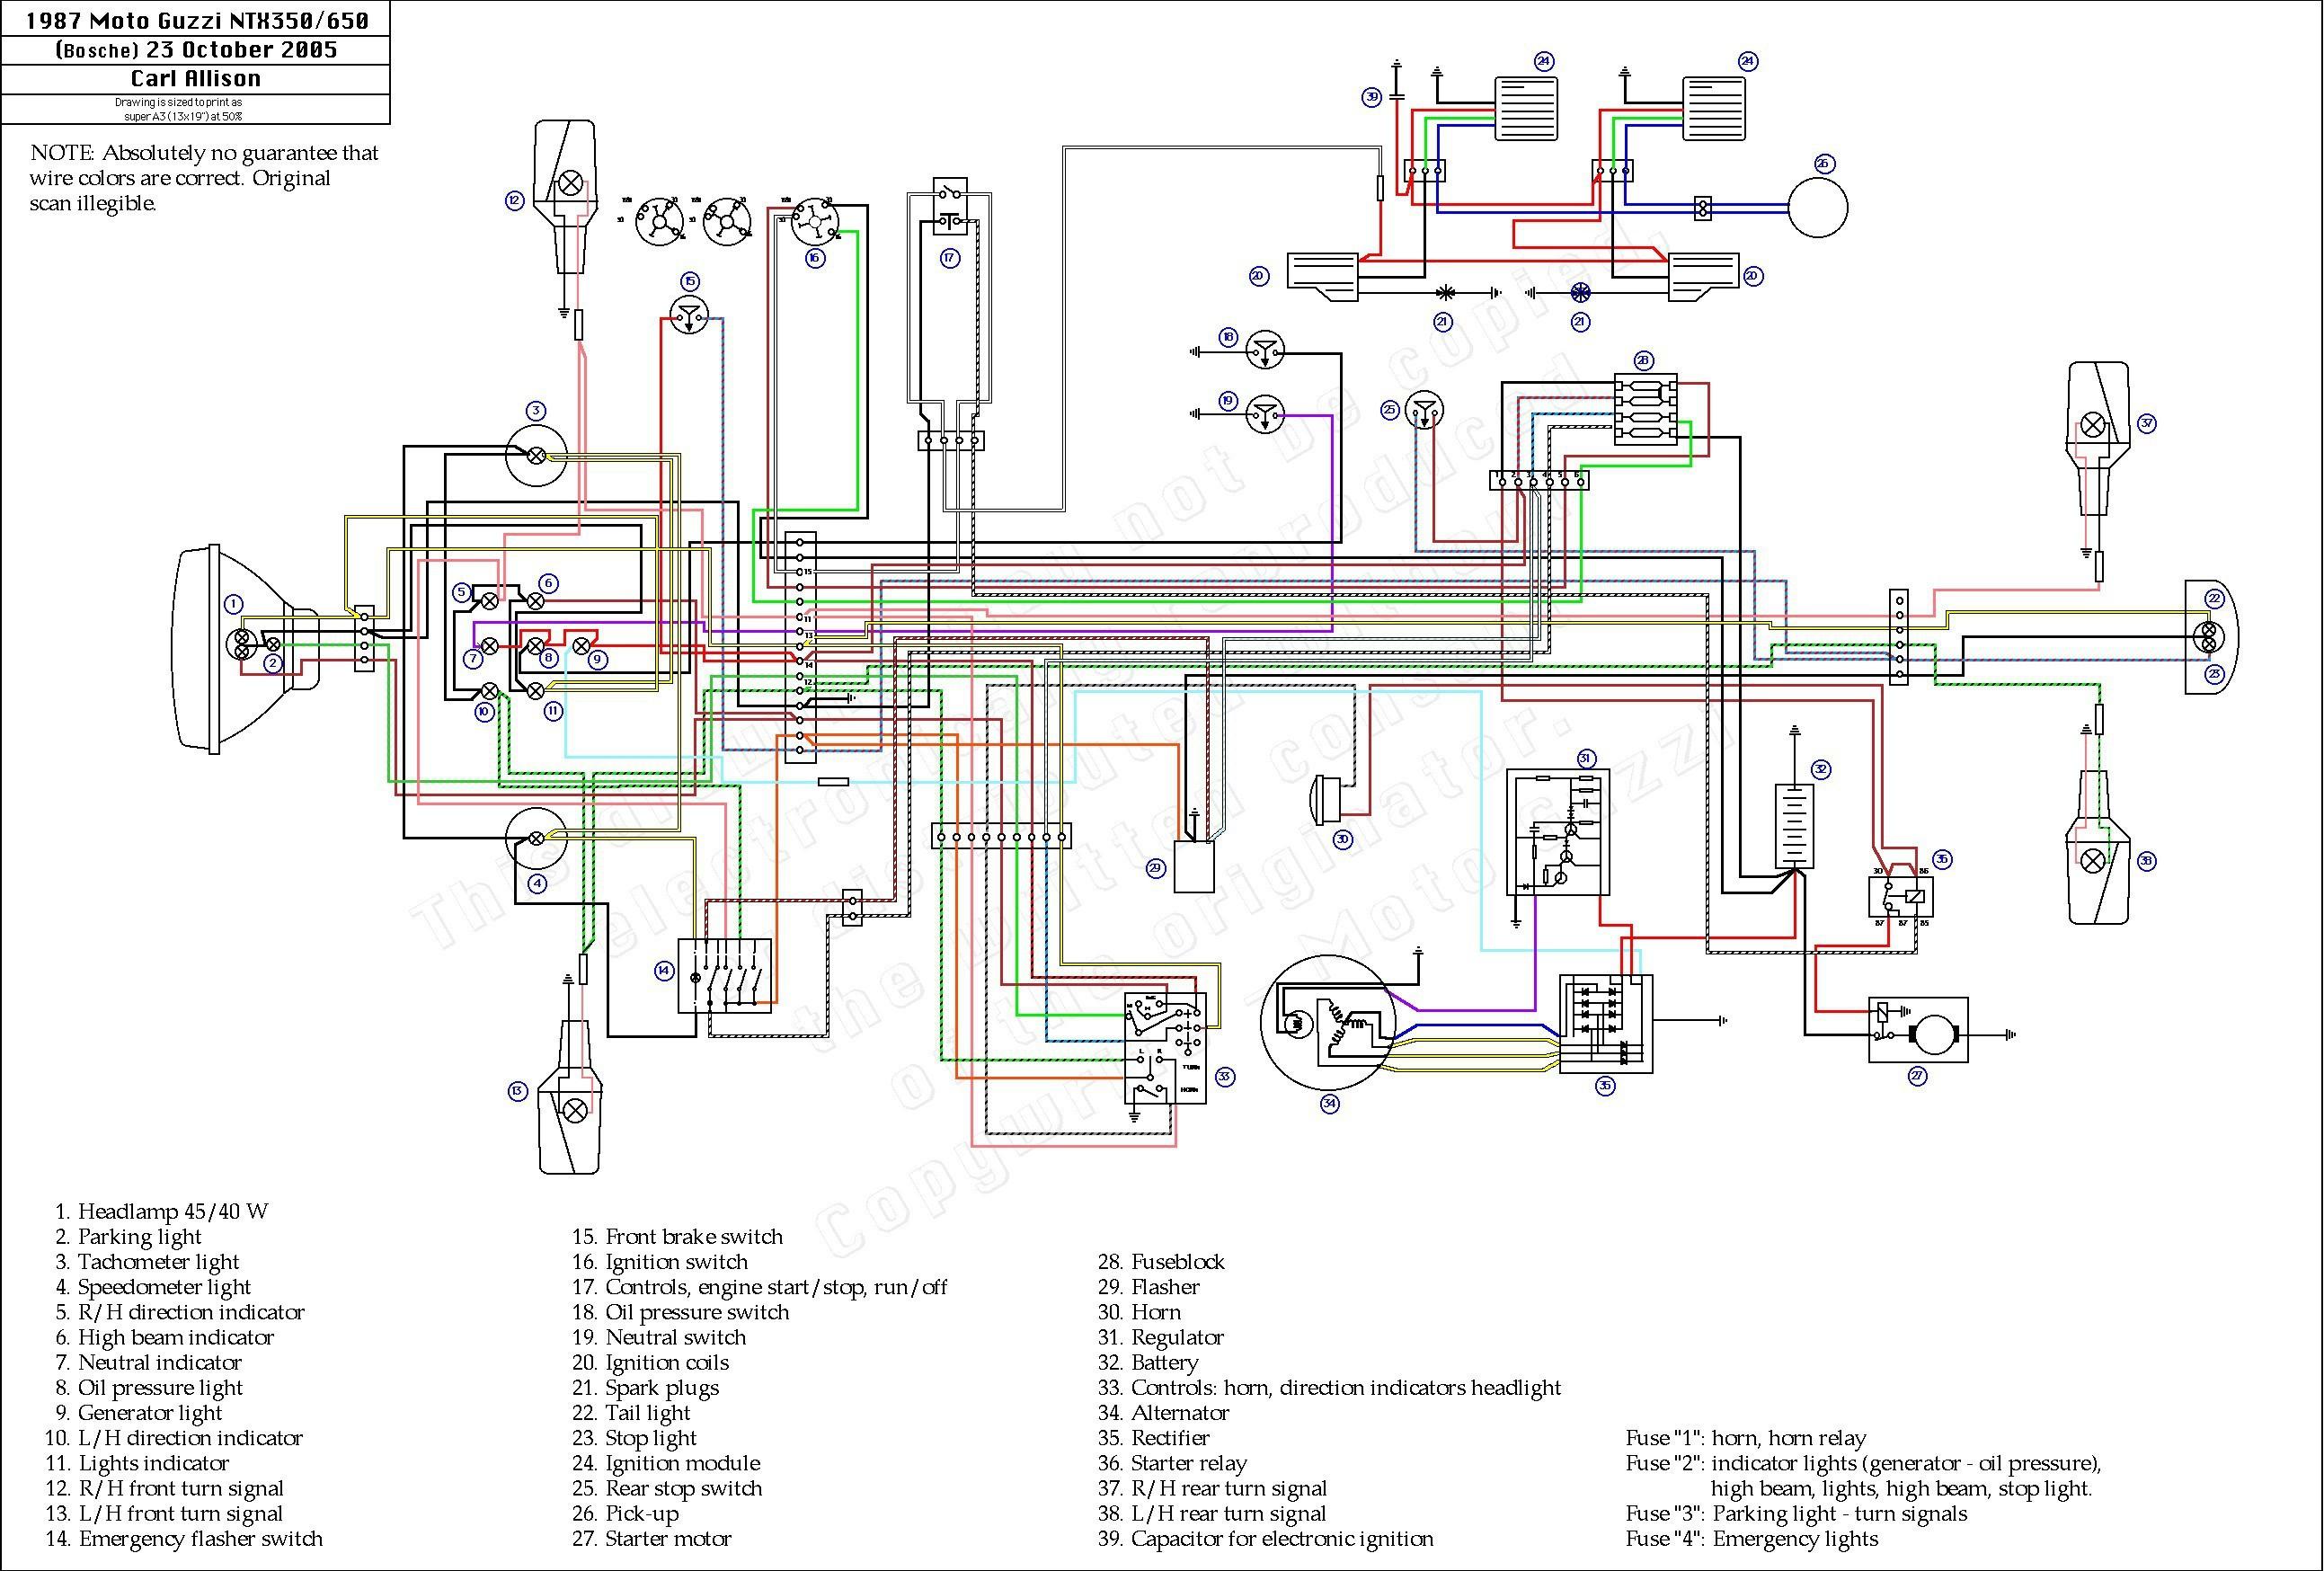 atv 50 wiring diagram tao wiring diagram wiring diagram data  tao wiring diagram wiring diagram data